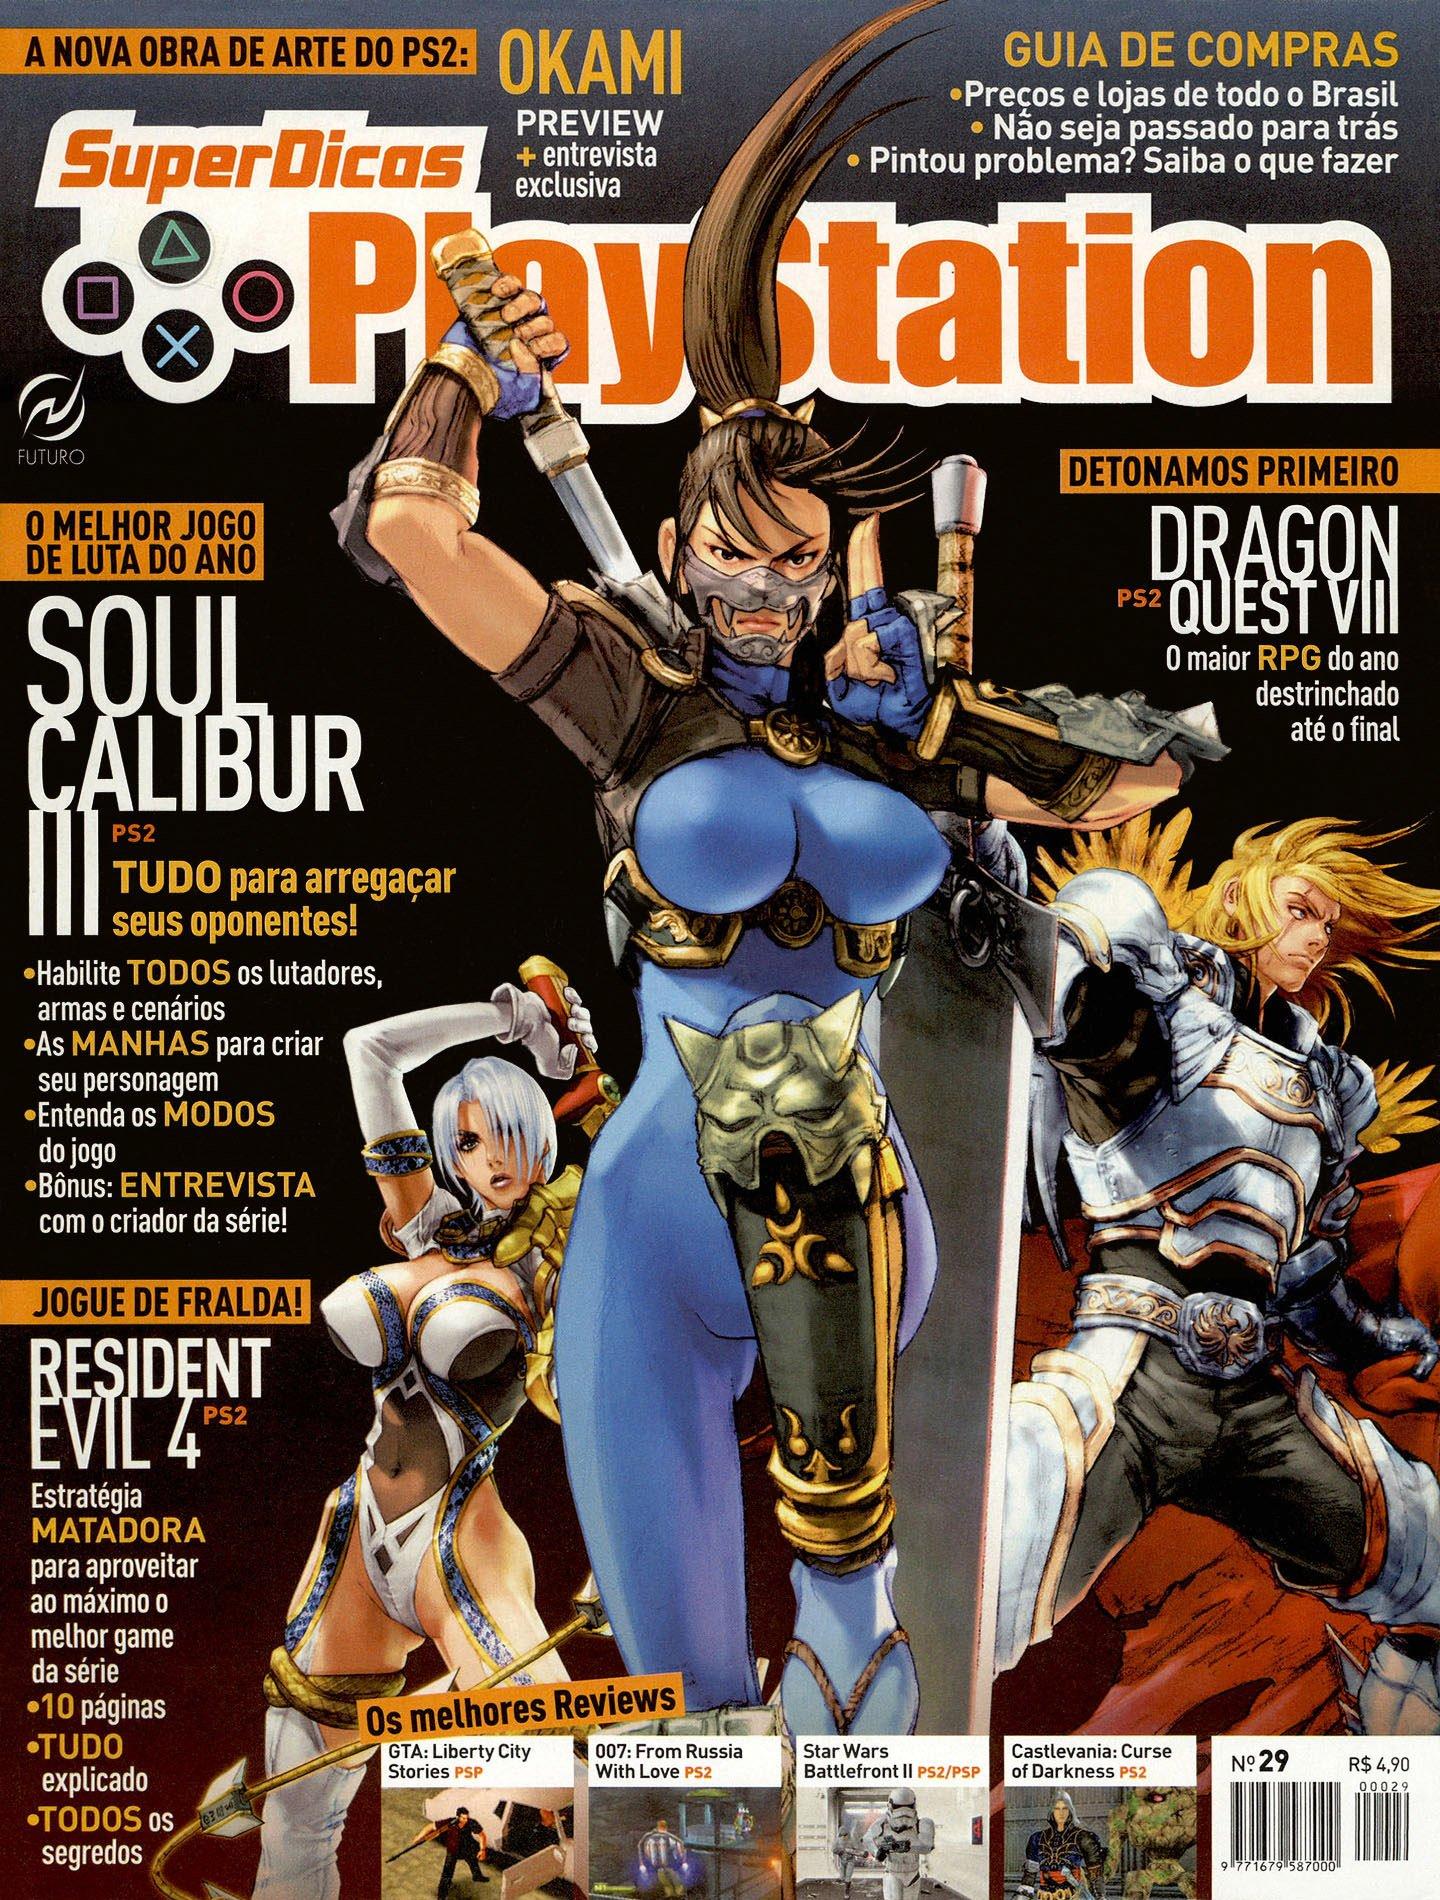 Super Dicas Playstation 29 (December 2005)